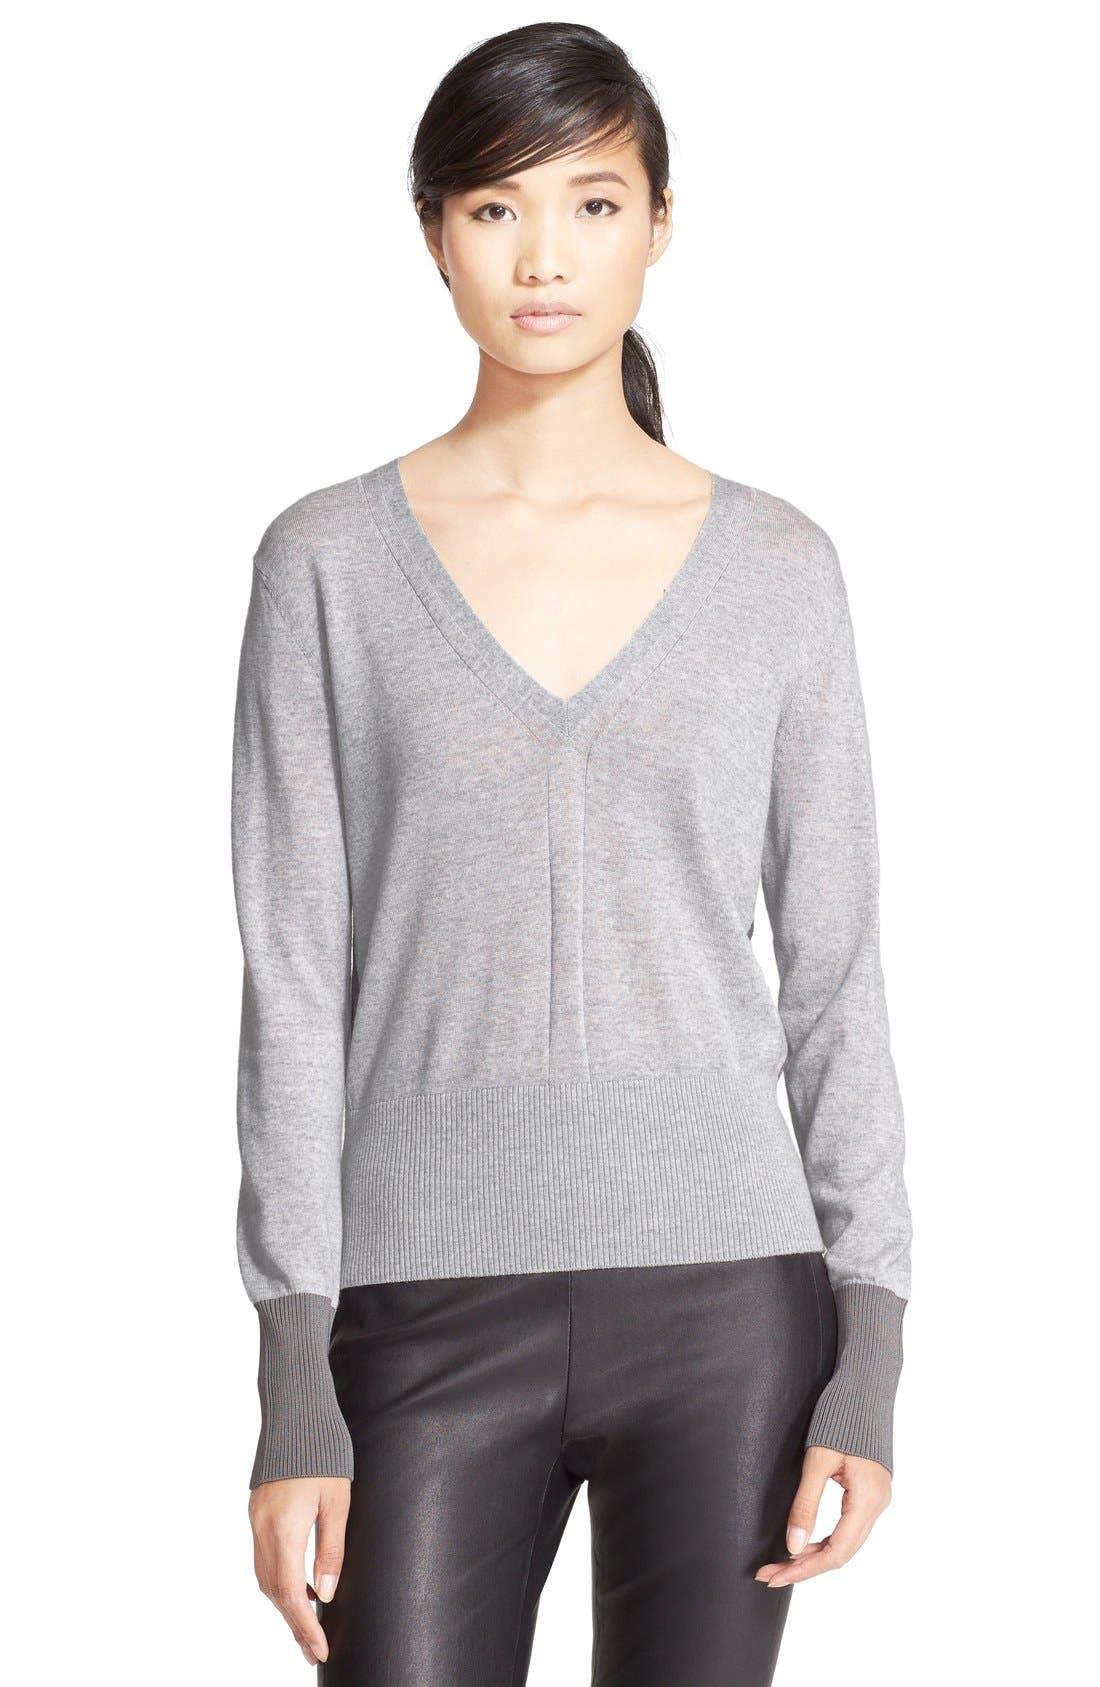 Alternate Image 1 Selected - rag & bone 'Jessica' Merino Wool V-Neck Sweater